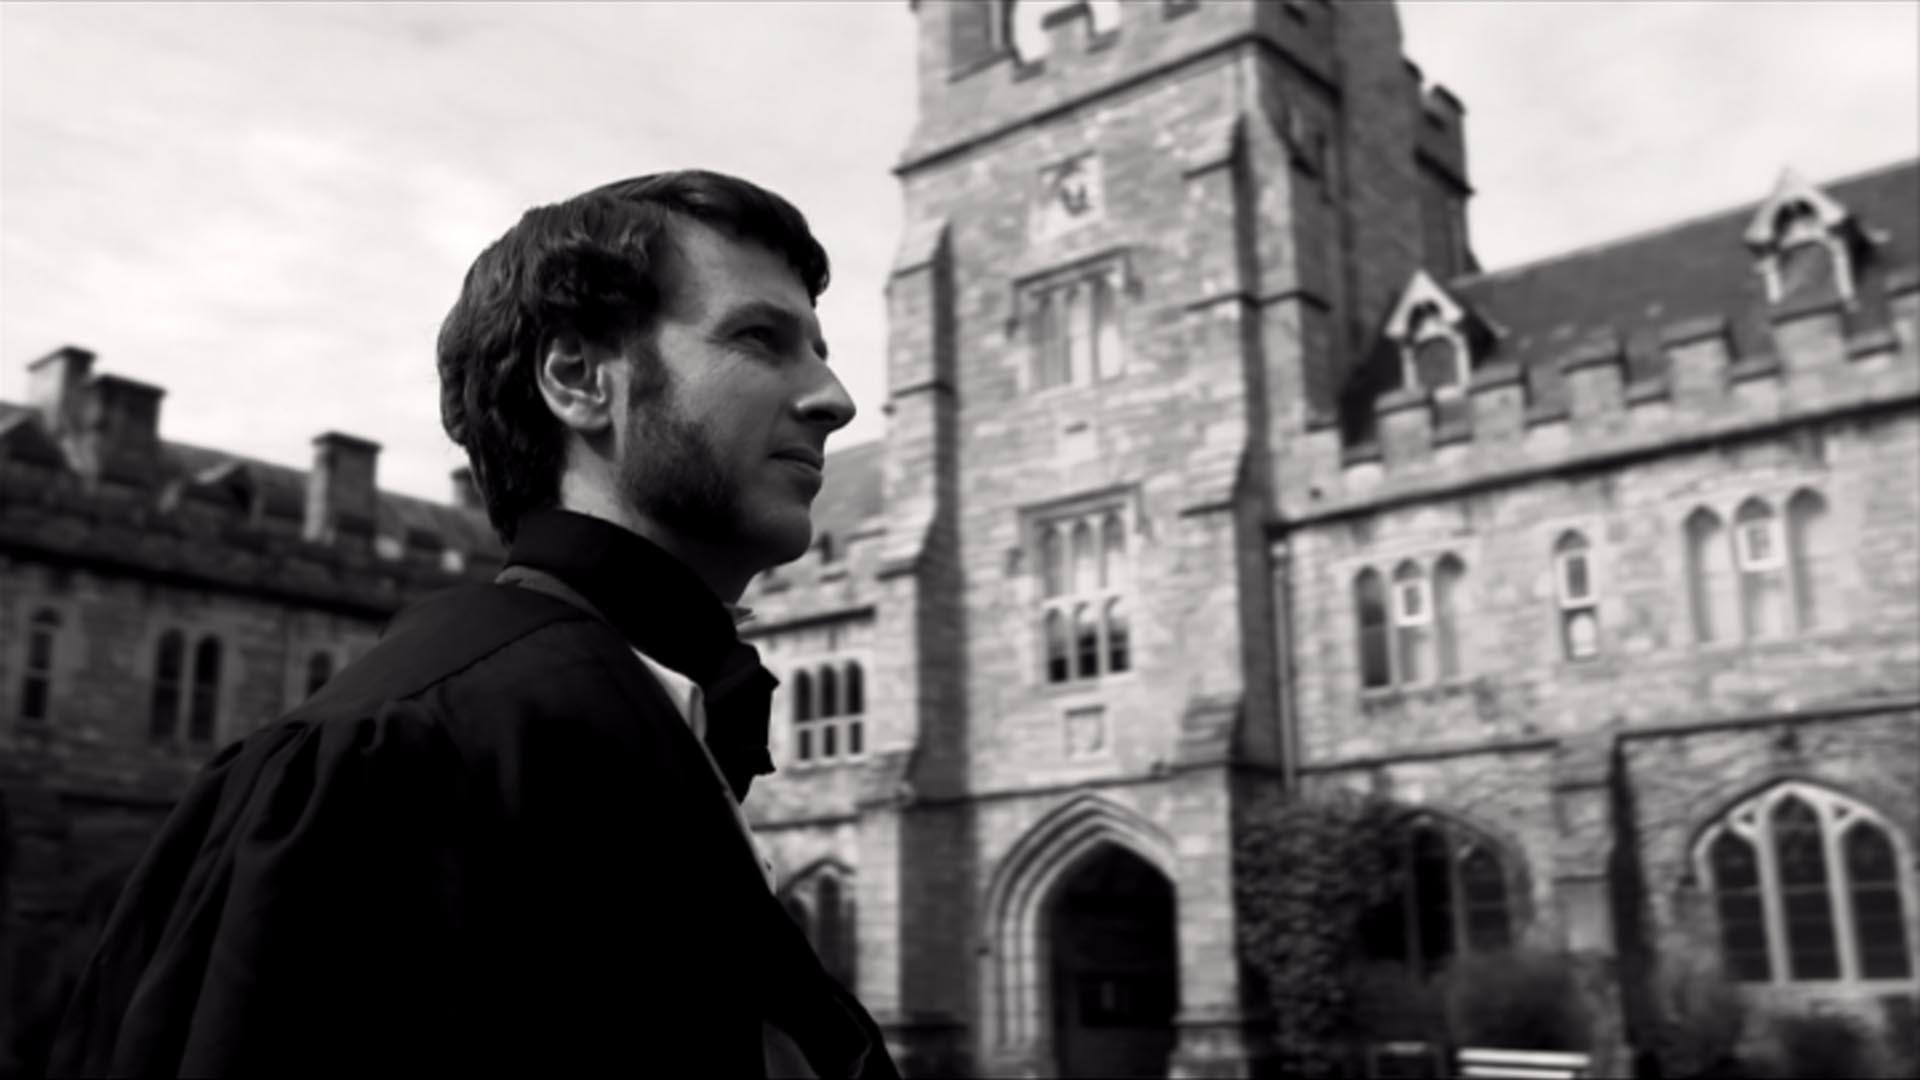 Photo credit: Oxford Film & Television